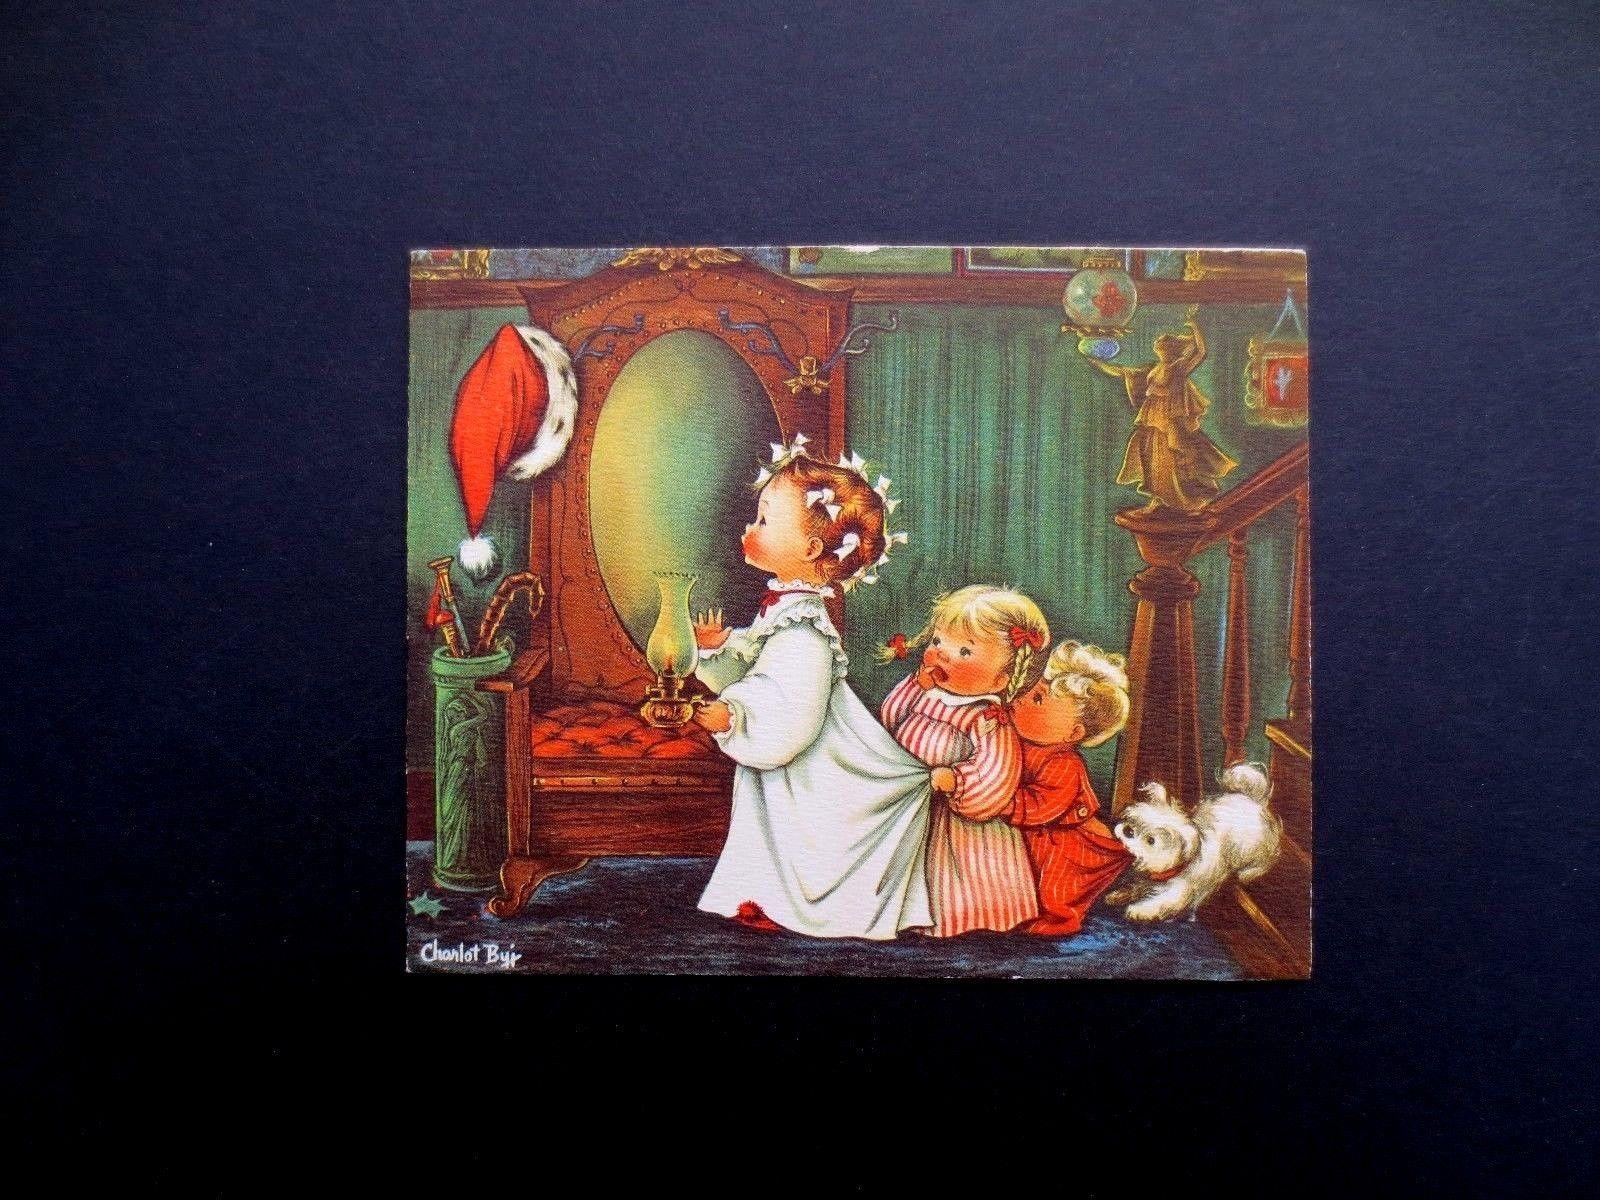 Vintage crestwick charlot byj byi xmas greeting card kids noticing vintage crestwick charlot byj byi xmas greeting card kids noticing santa039s hat kristyandbryce Images